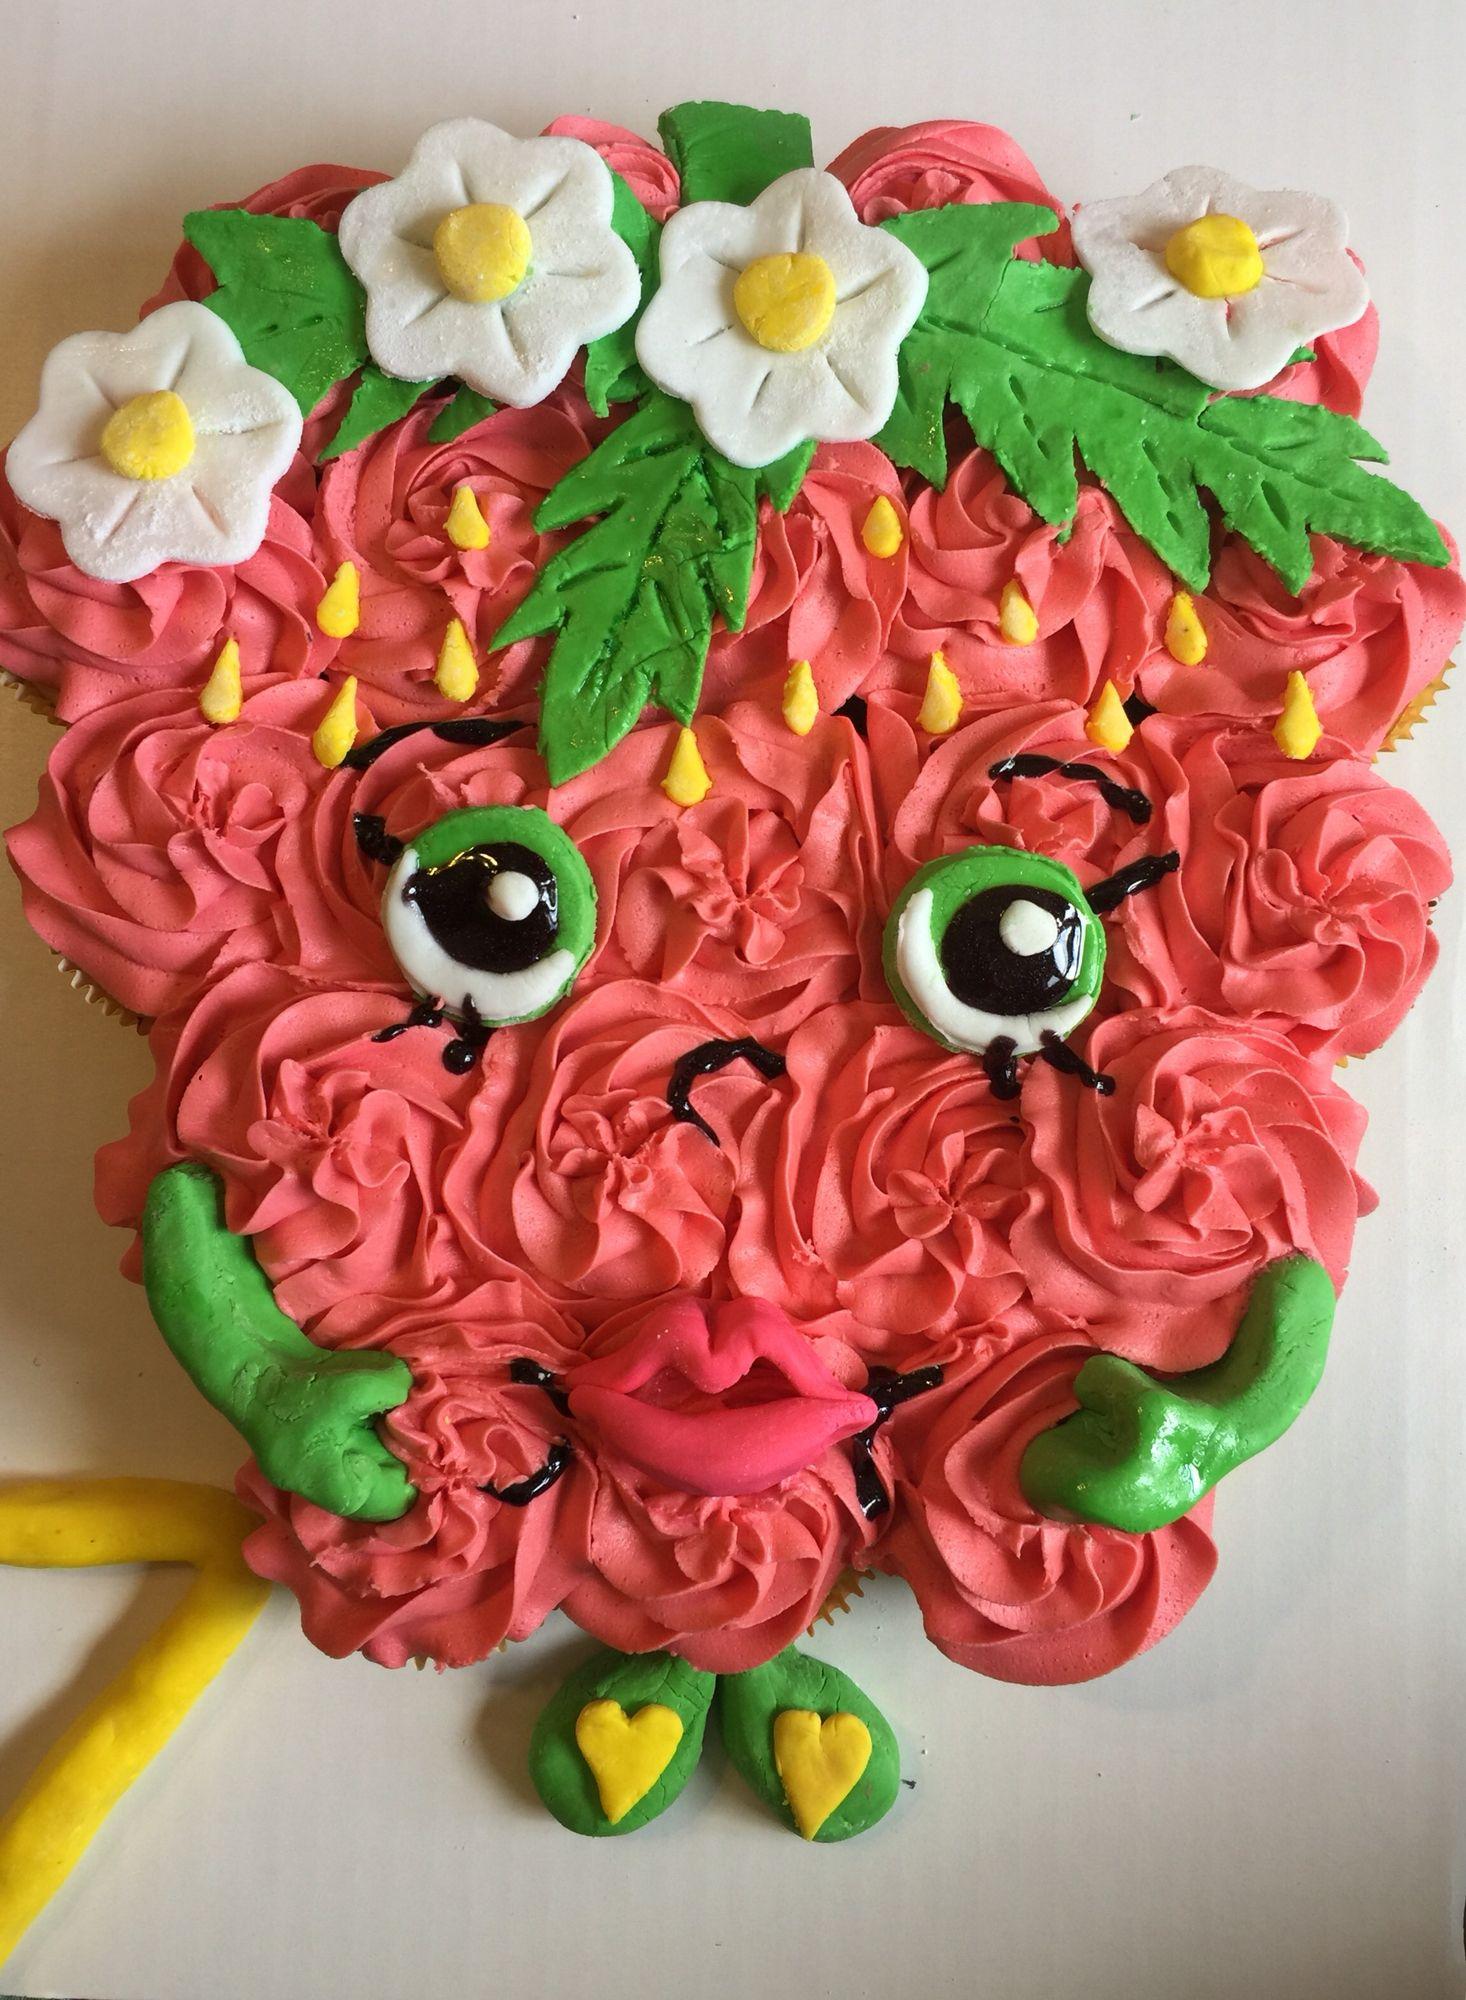 Shopkins Strawberry Kiss cupcake cake!